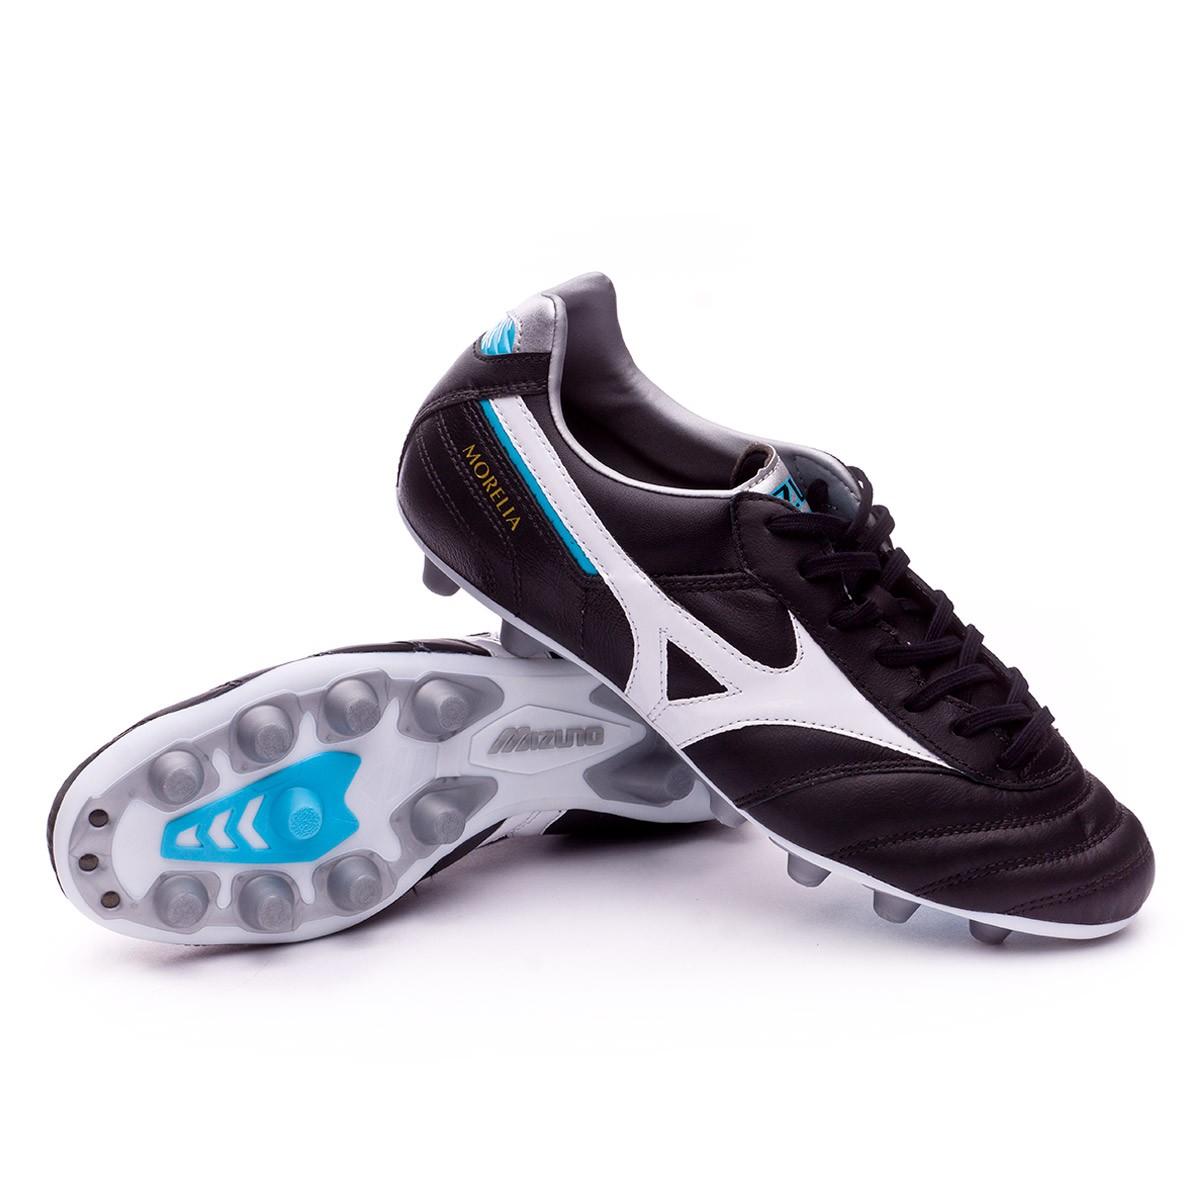 0506c0ecee059 Football Boots Mizuno Morelia II MD Black-White-Blue atomic - Tienda ...